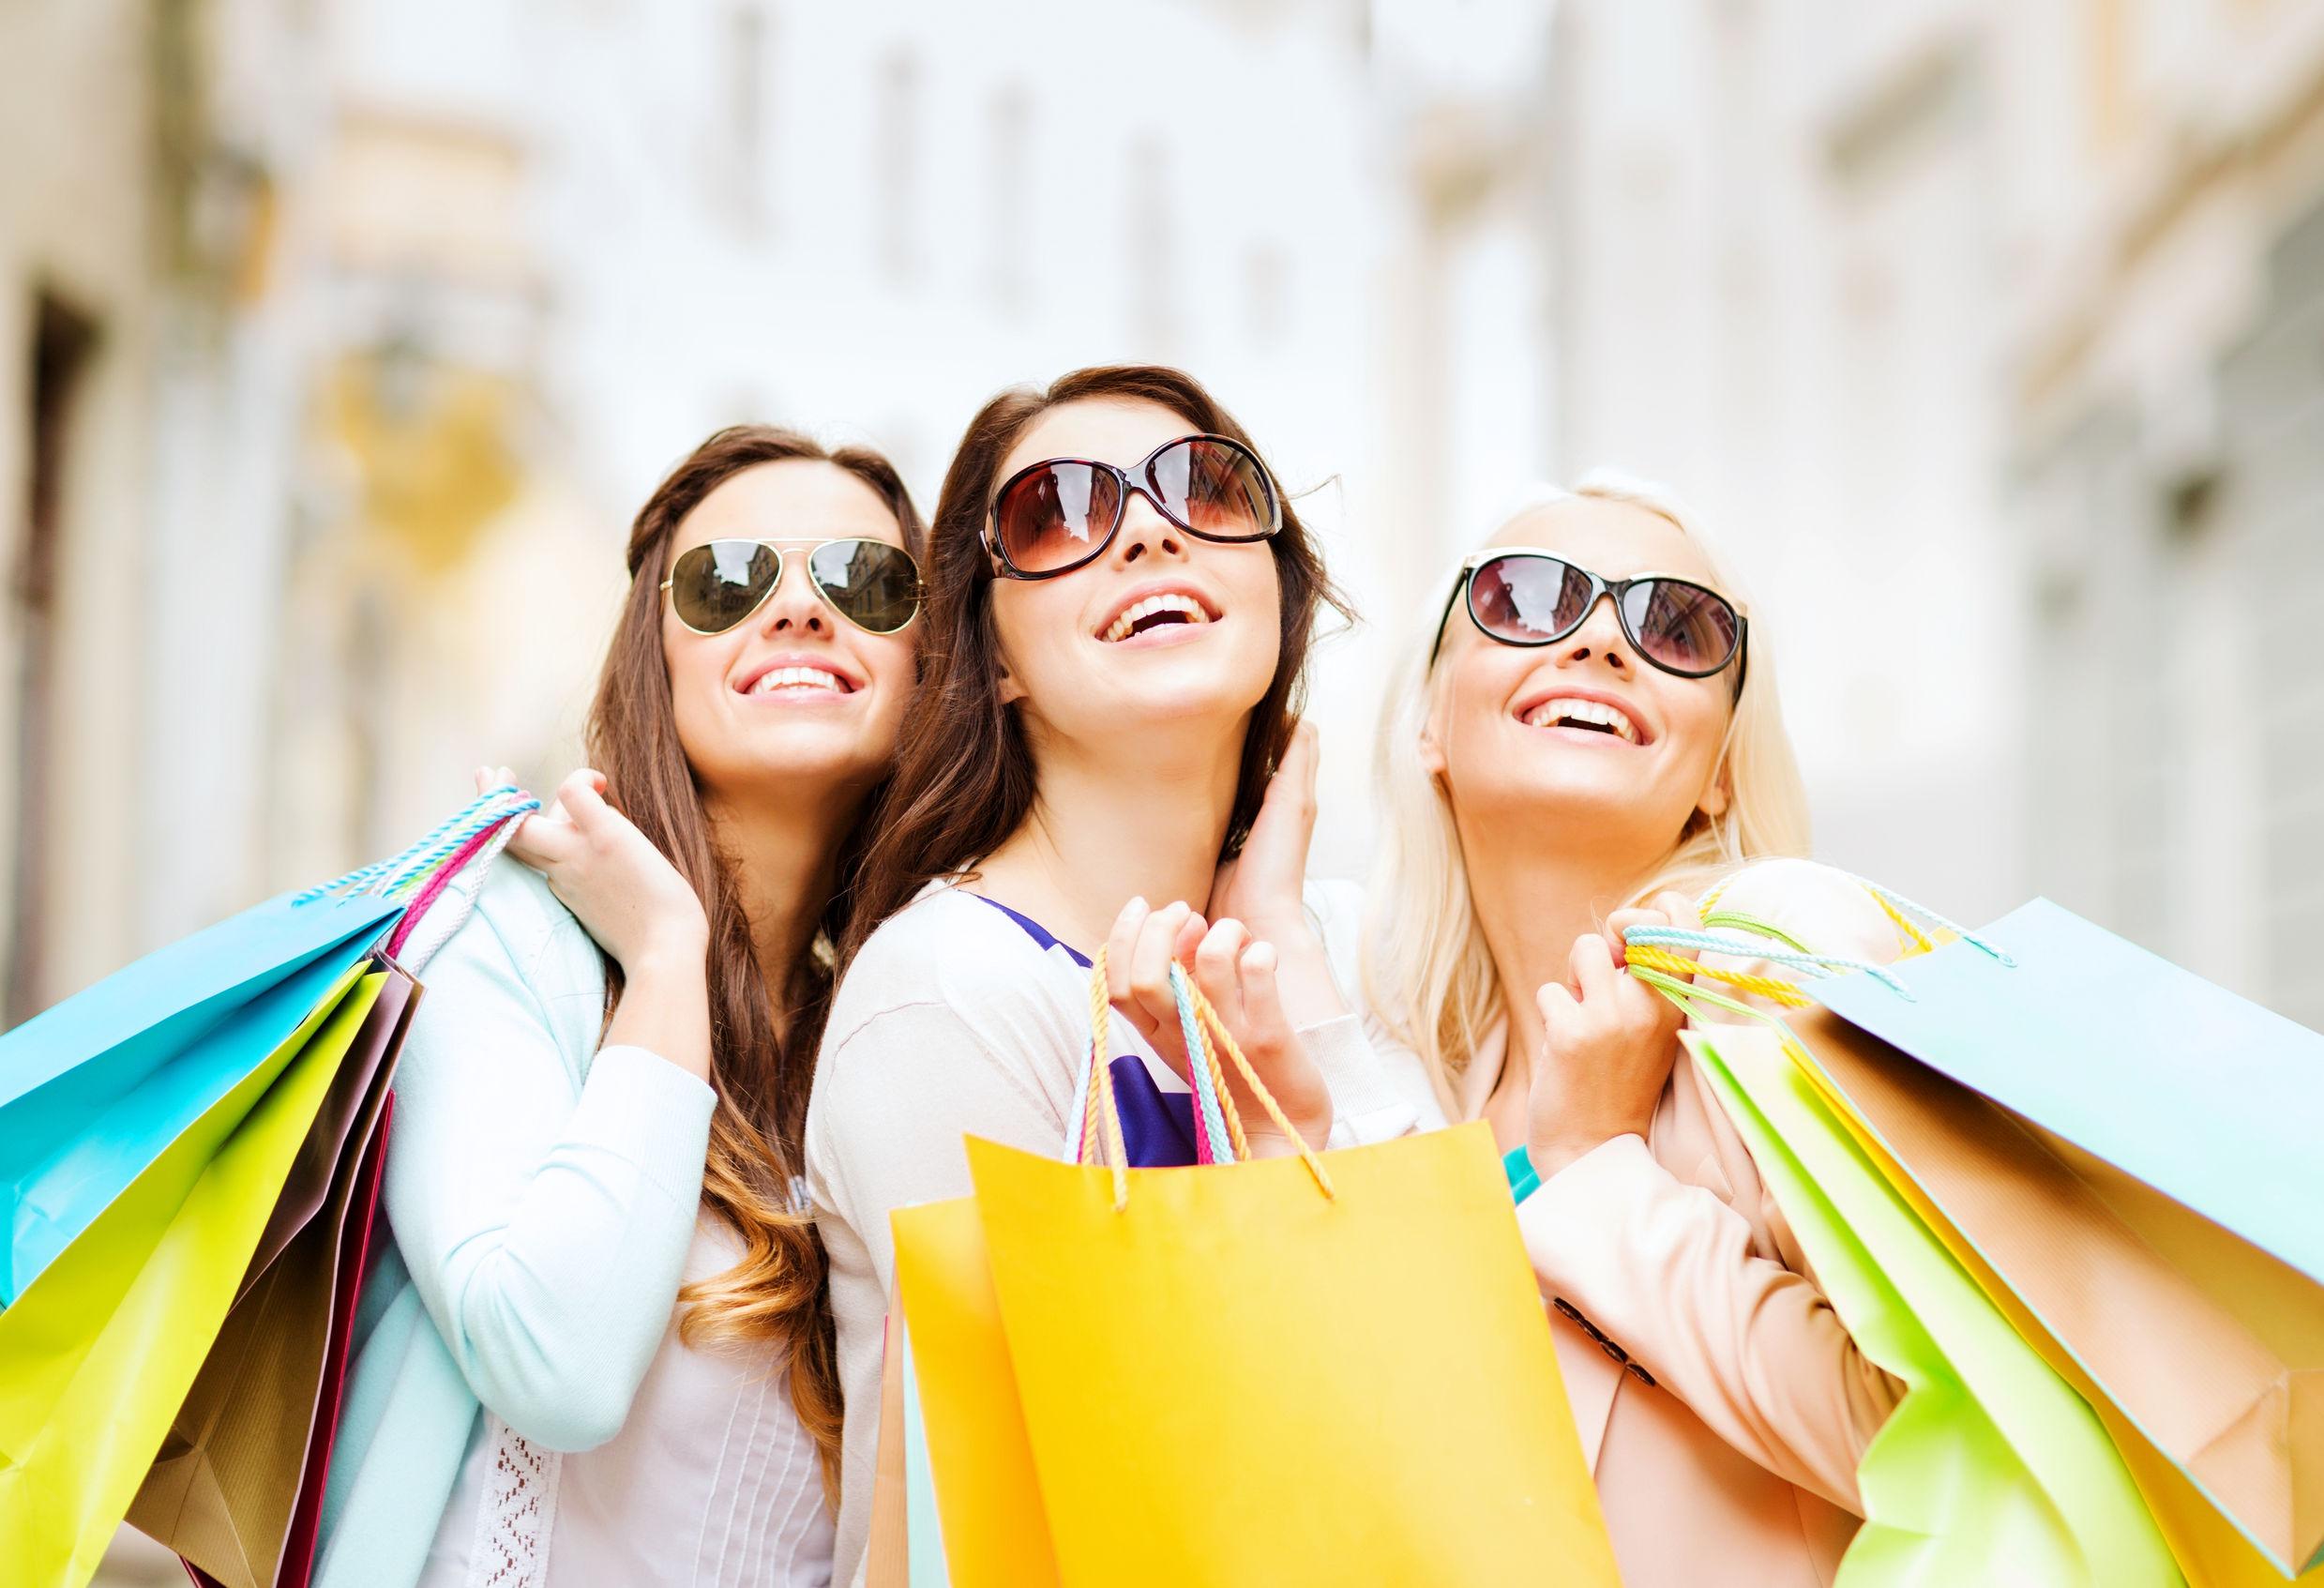 Shop online stop and shop